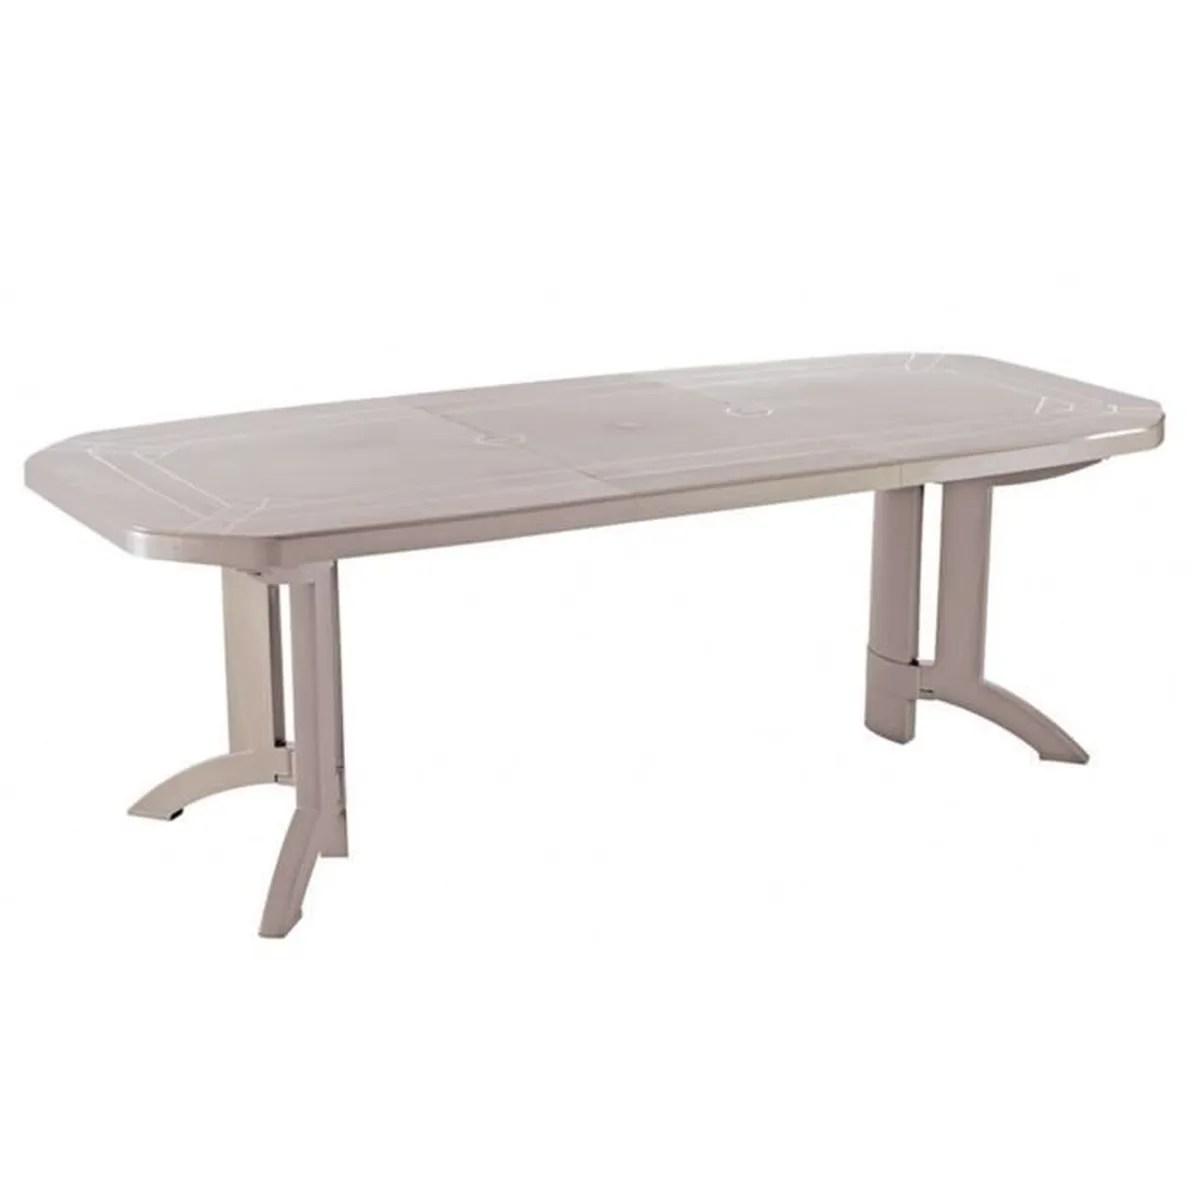 Table De Jardin Resine Extensible   Table De Jardin Extensible Auchan